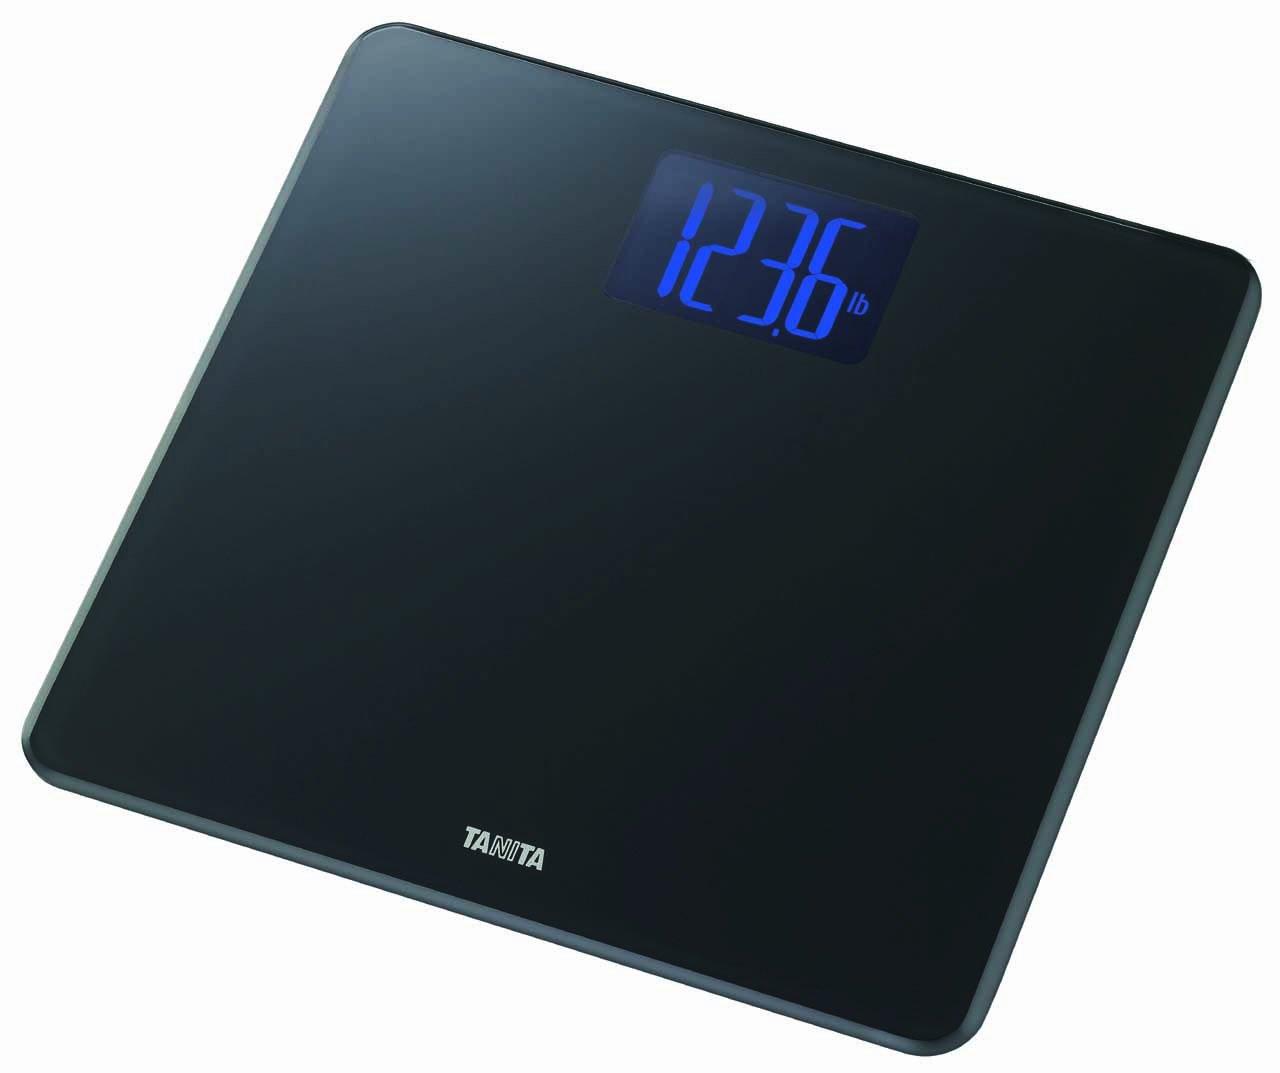 Tanita HD-366 Digital Designer Glass Bathroom Scale - Buy ...